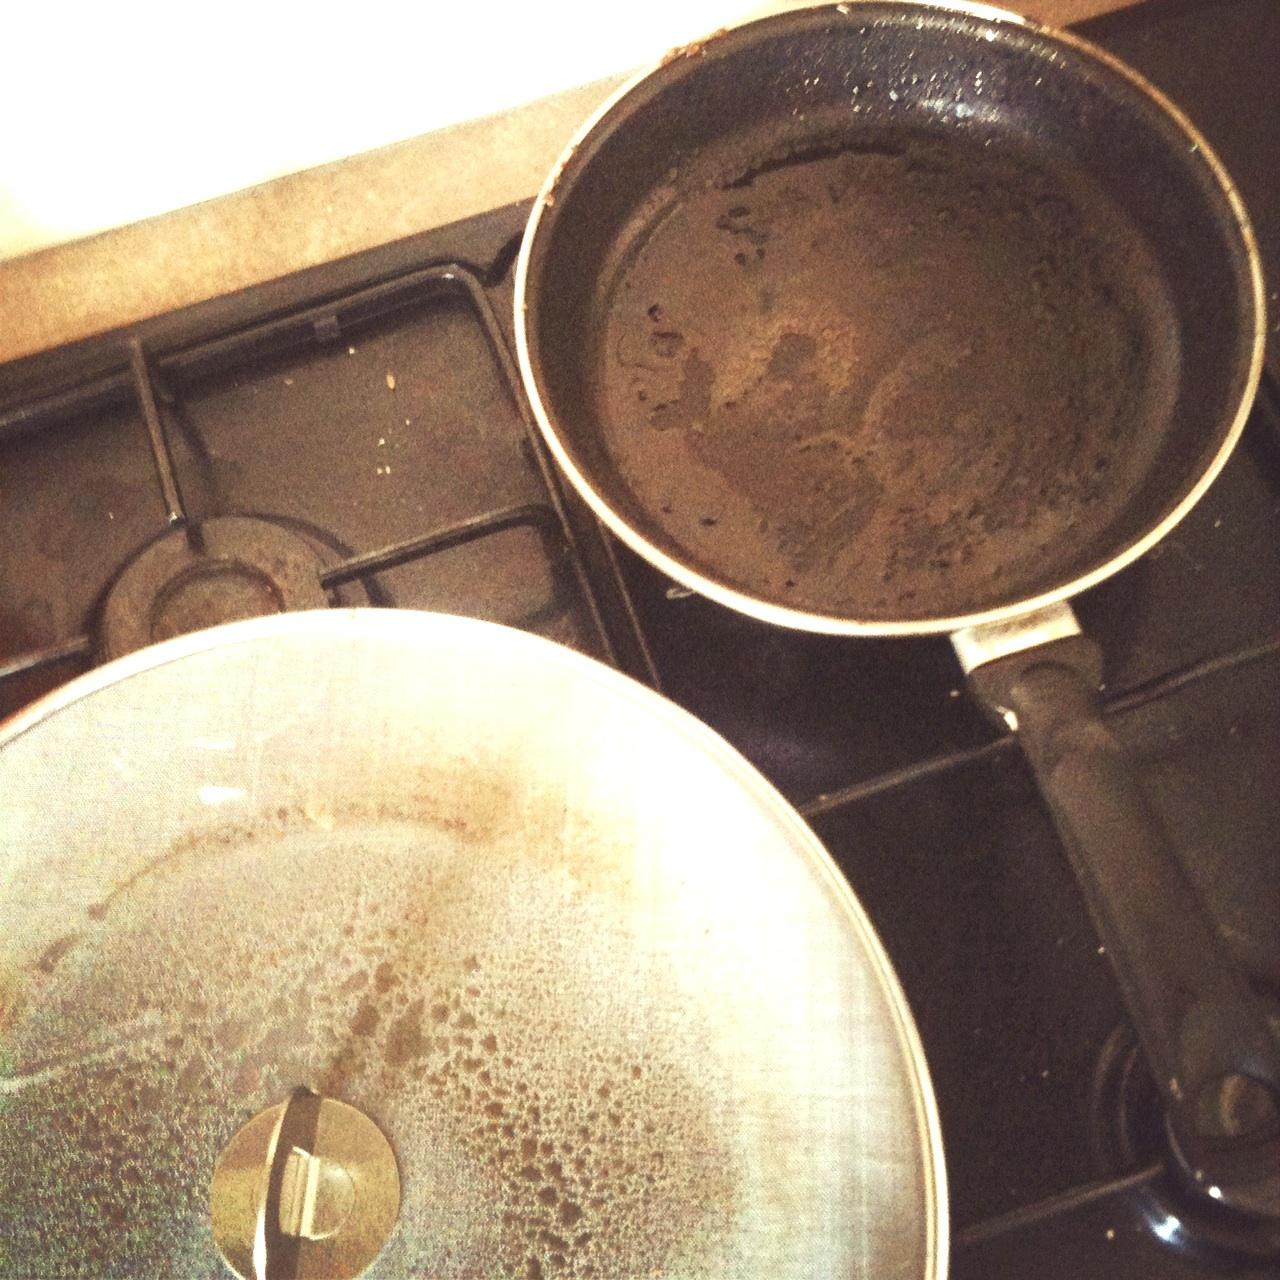 Cauchemar en cuisine allo maman dodo - Recette cauchemar en cuisine ...